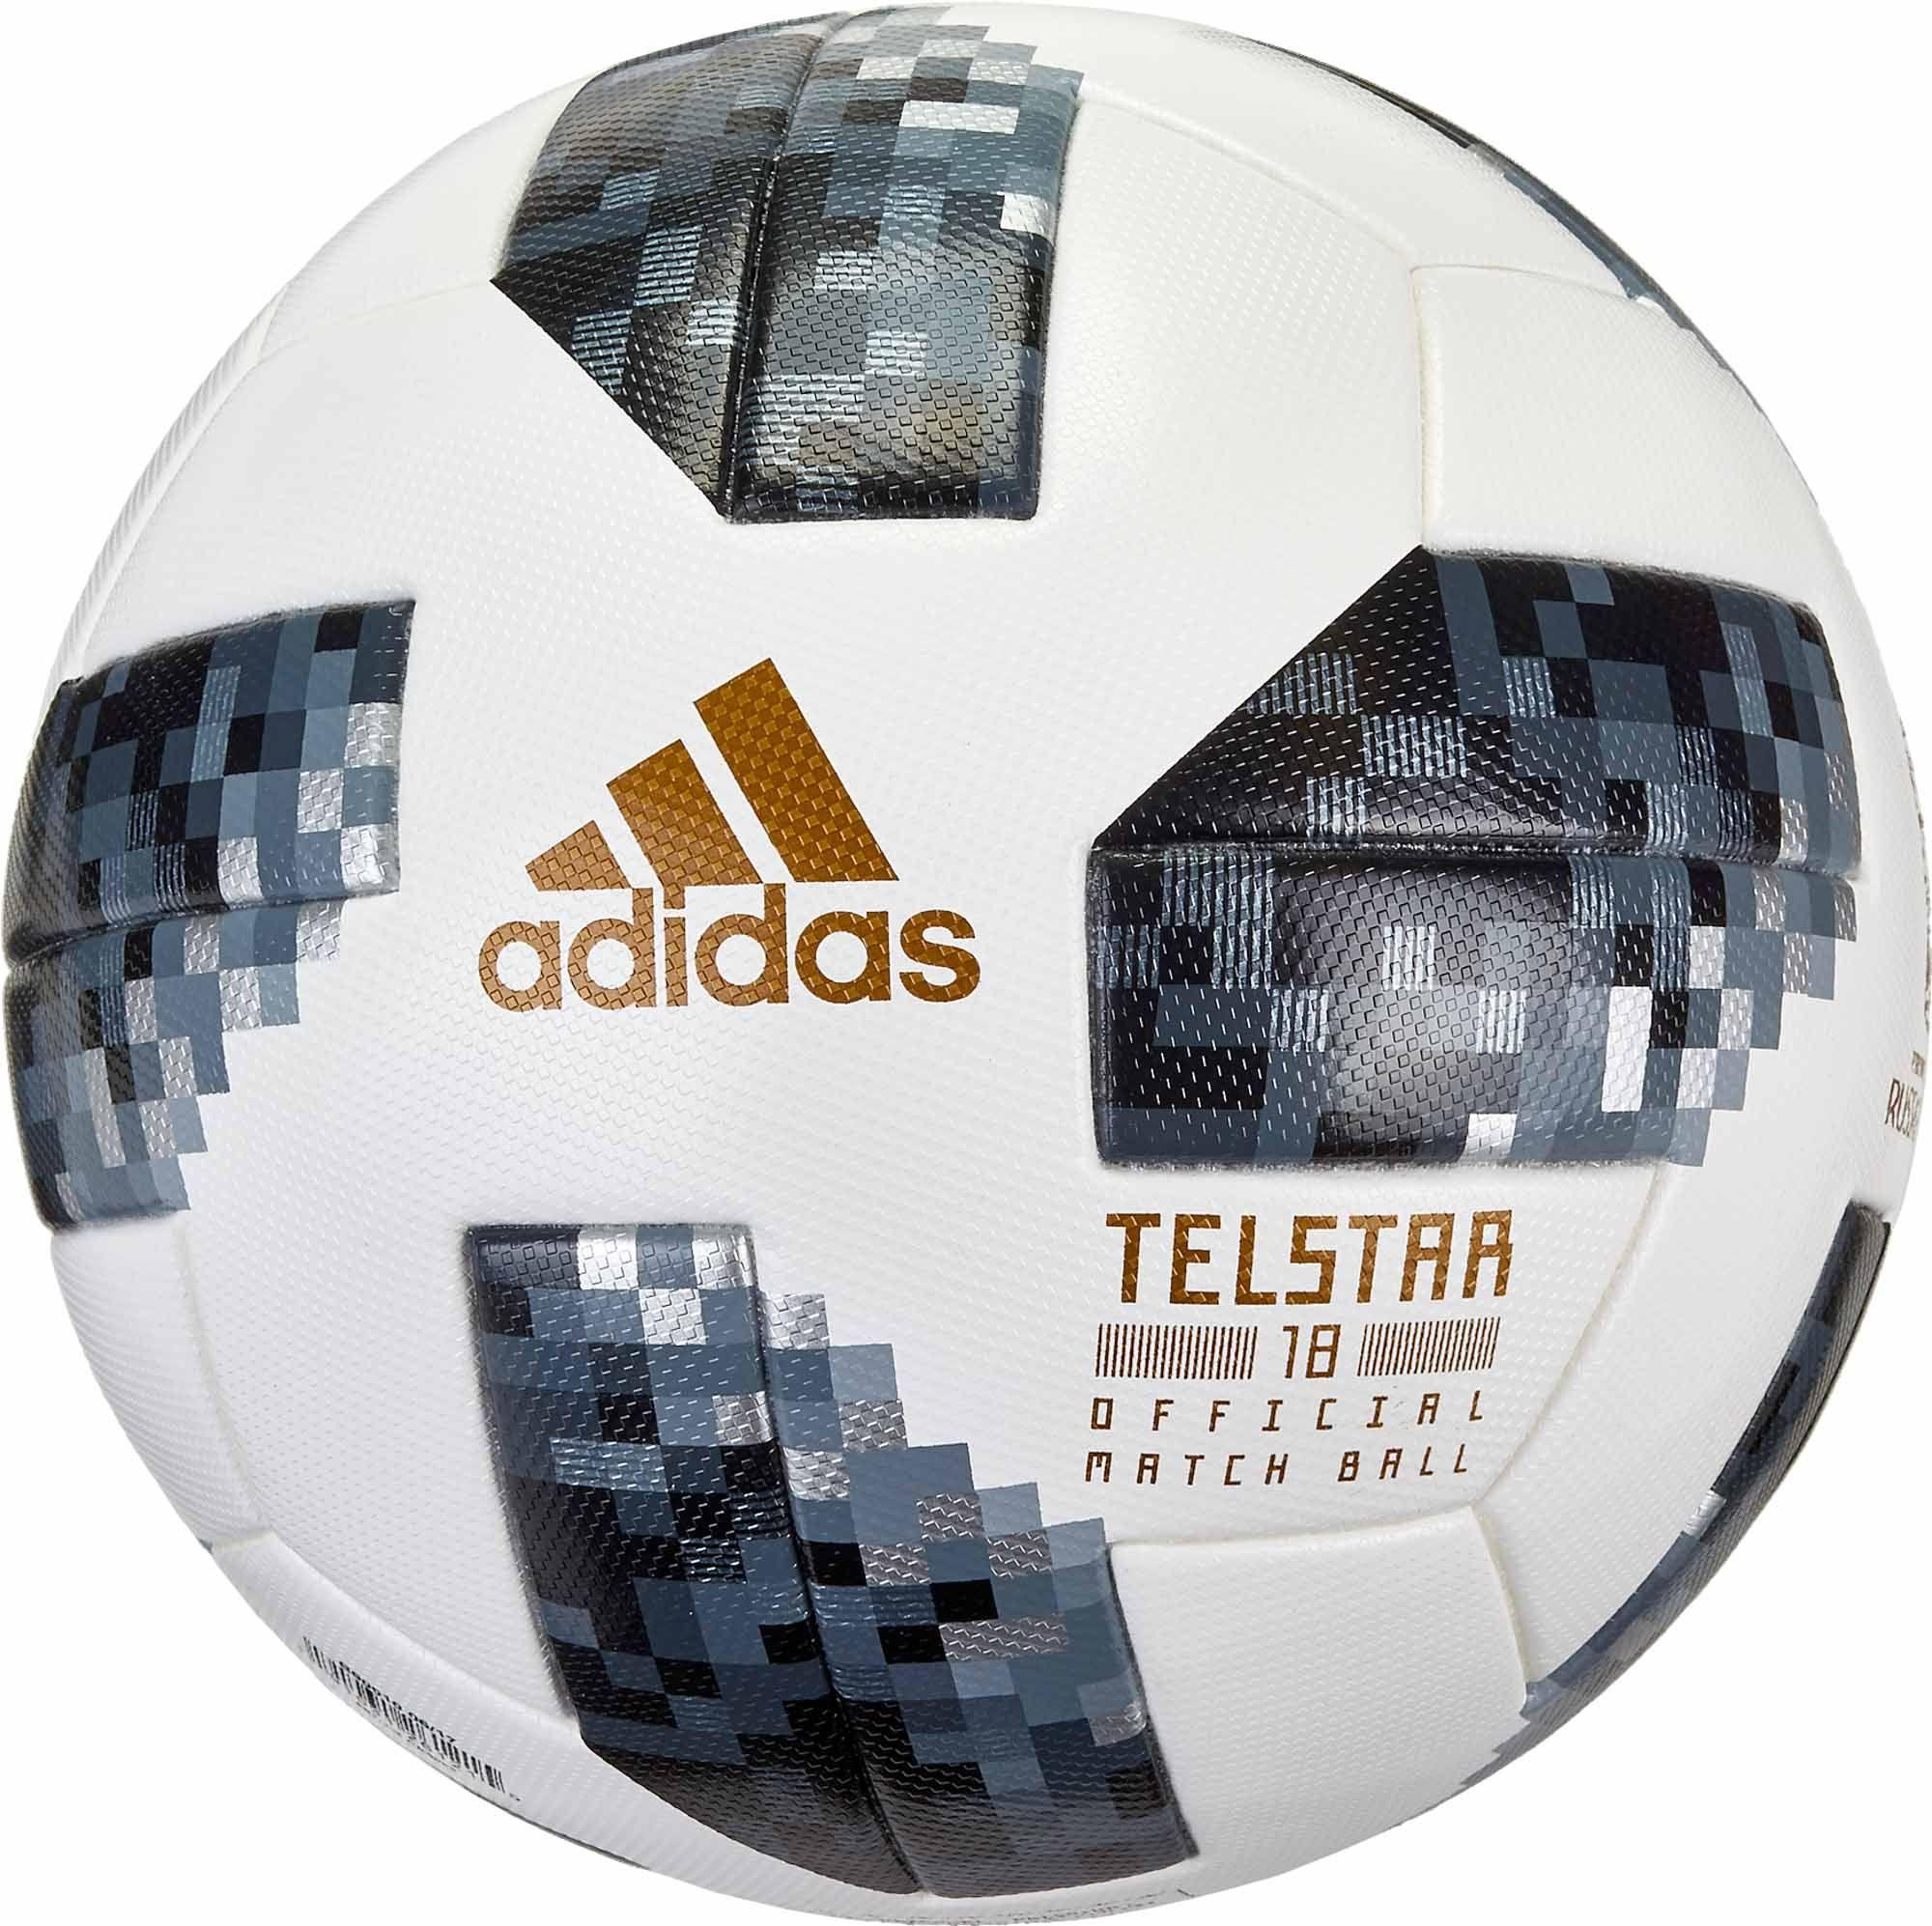 Telstar 18 a1a1ab4978f55